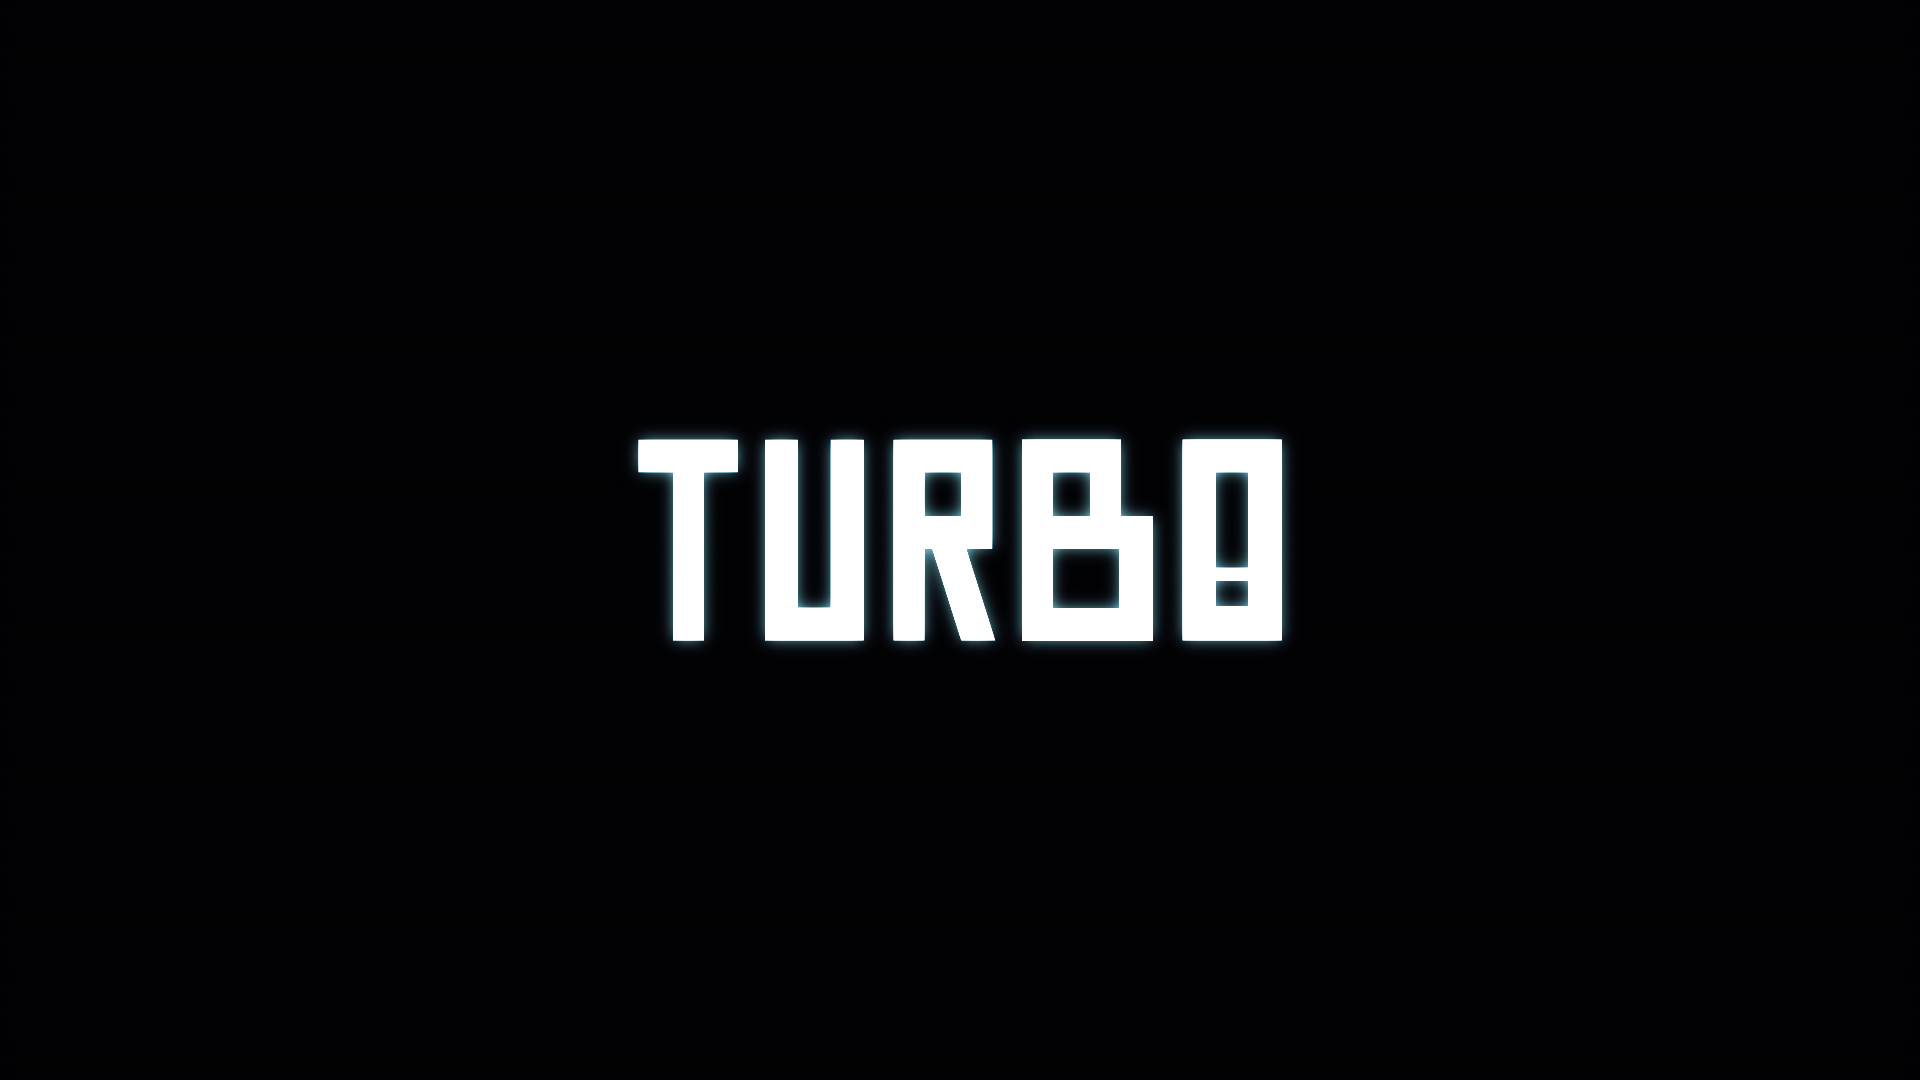 Turbo_D1_04.jpg